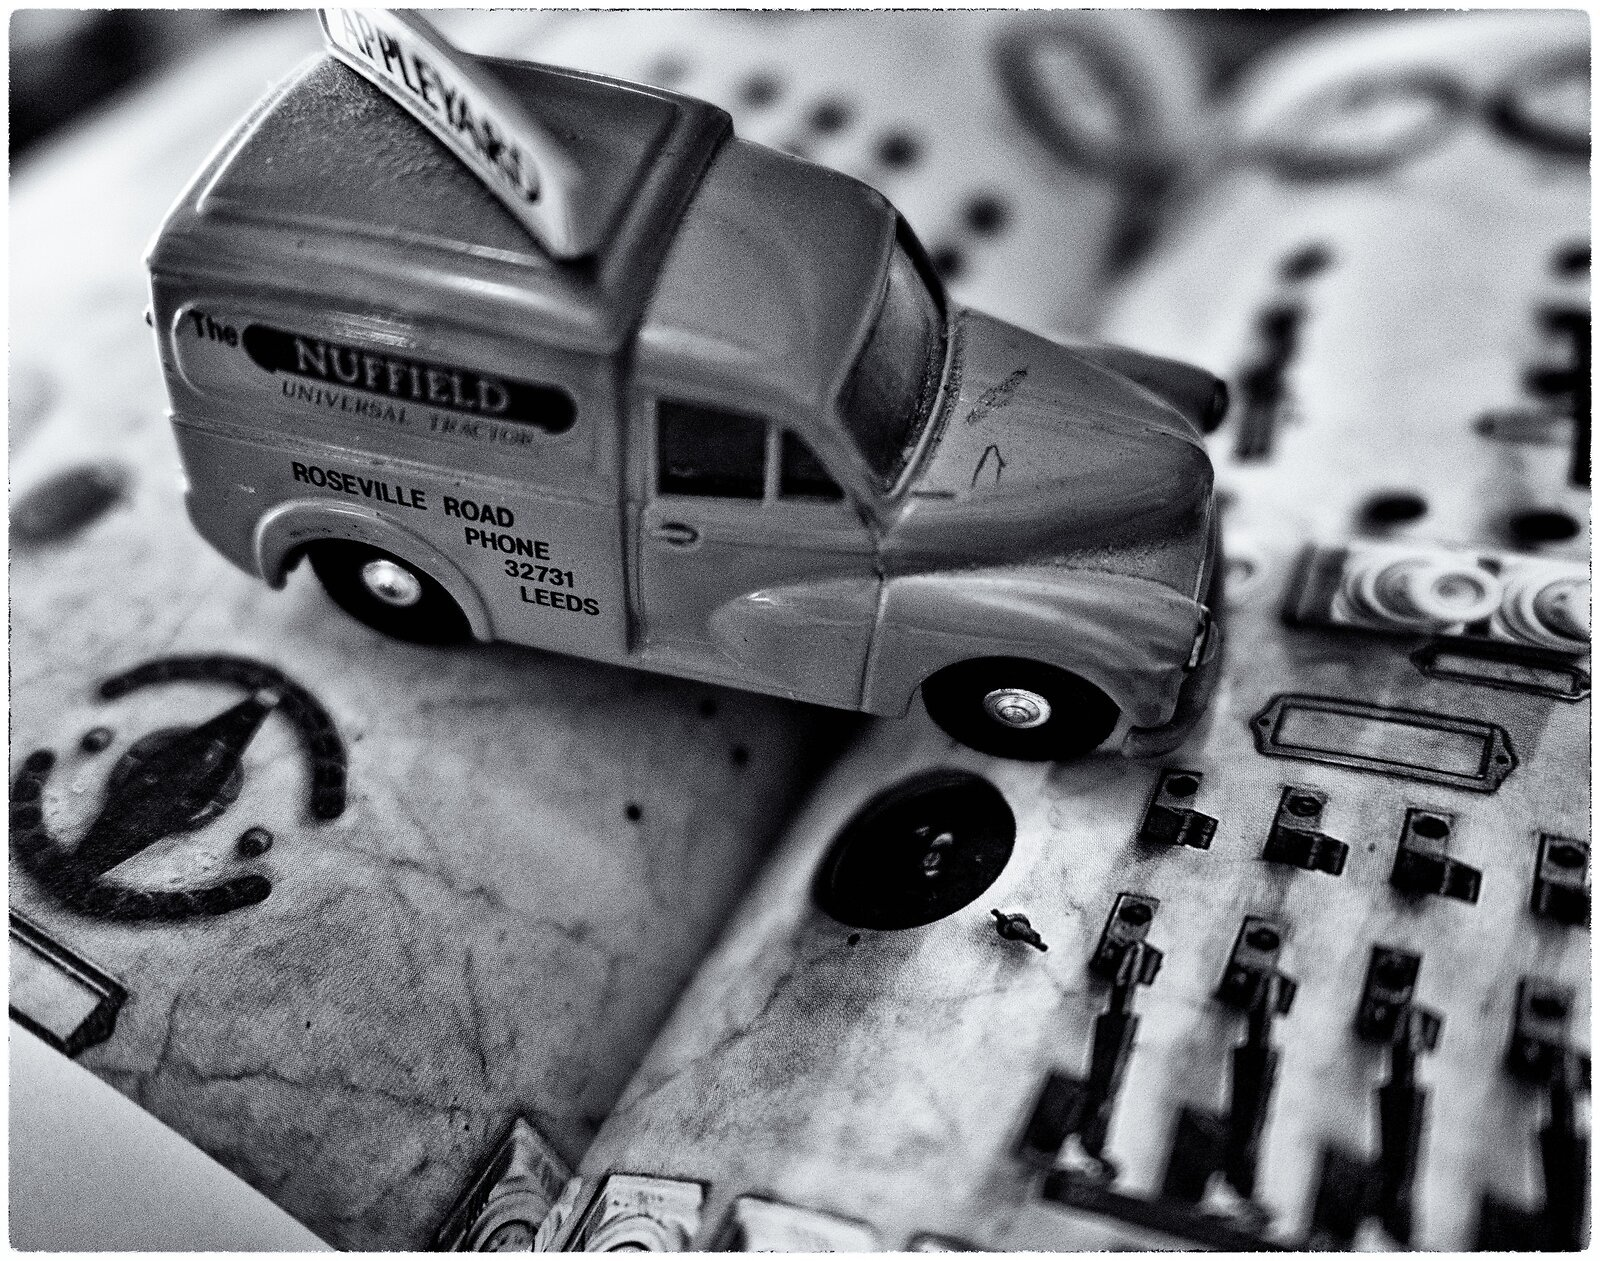 GX9_Jun17_21_truck&book(silver.efex).jpg